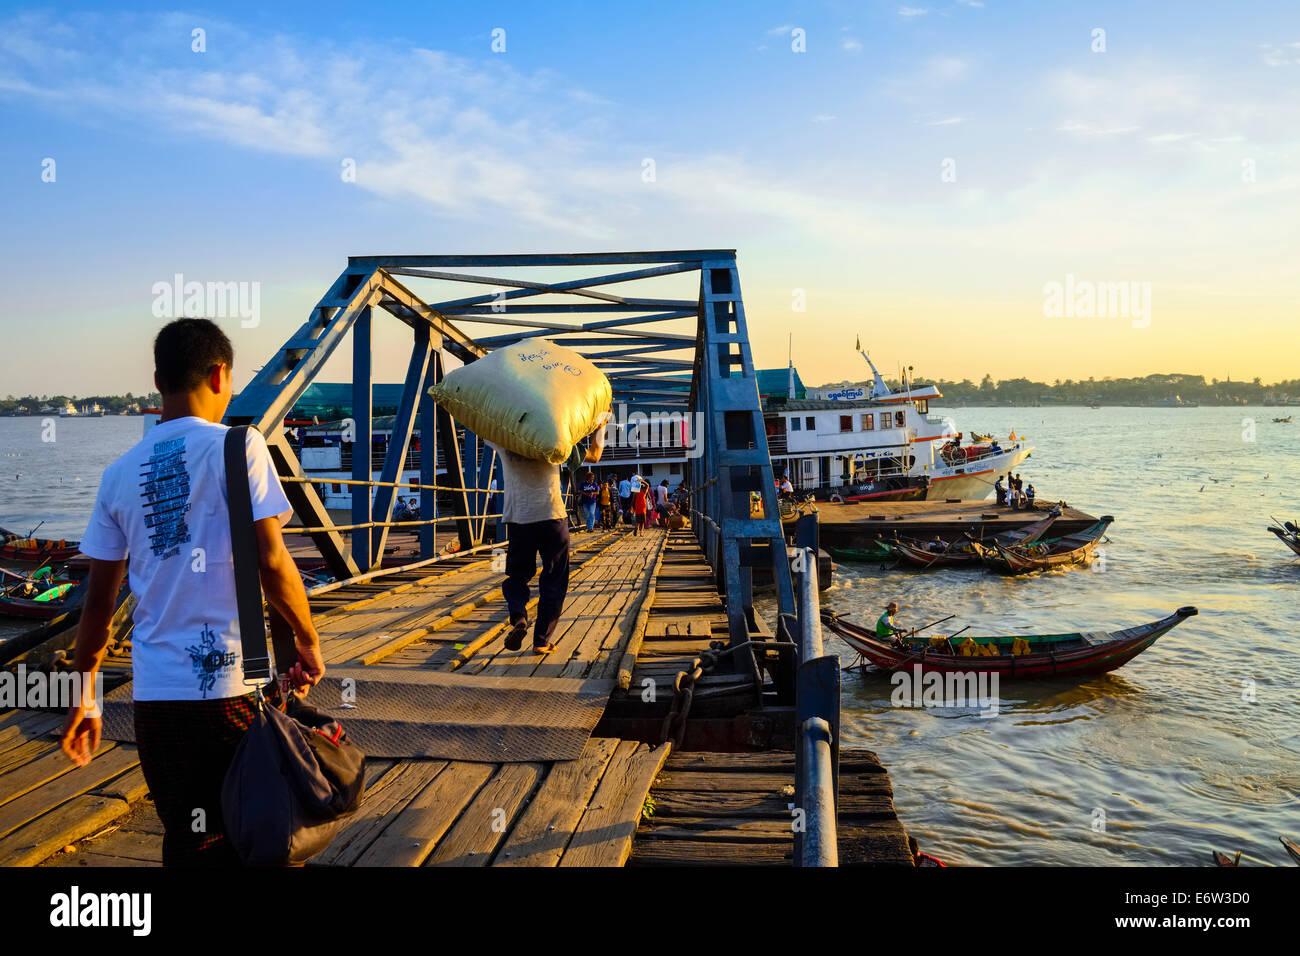 At the jetty, Yangon, Myanmar, Asia Stock Photo